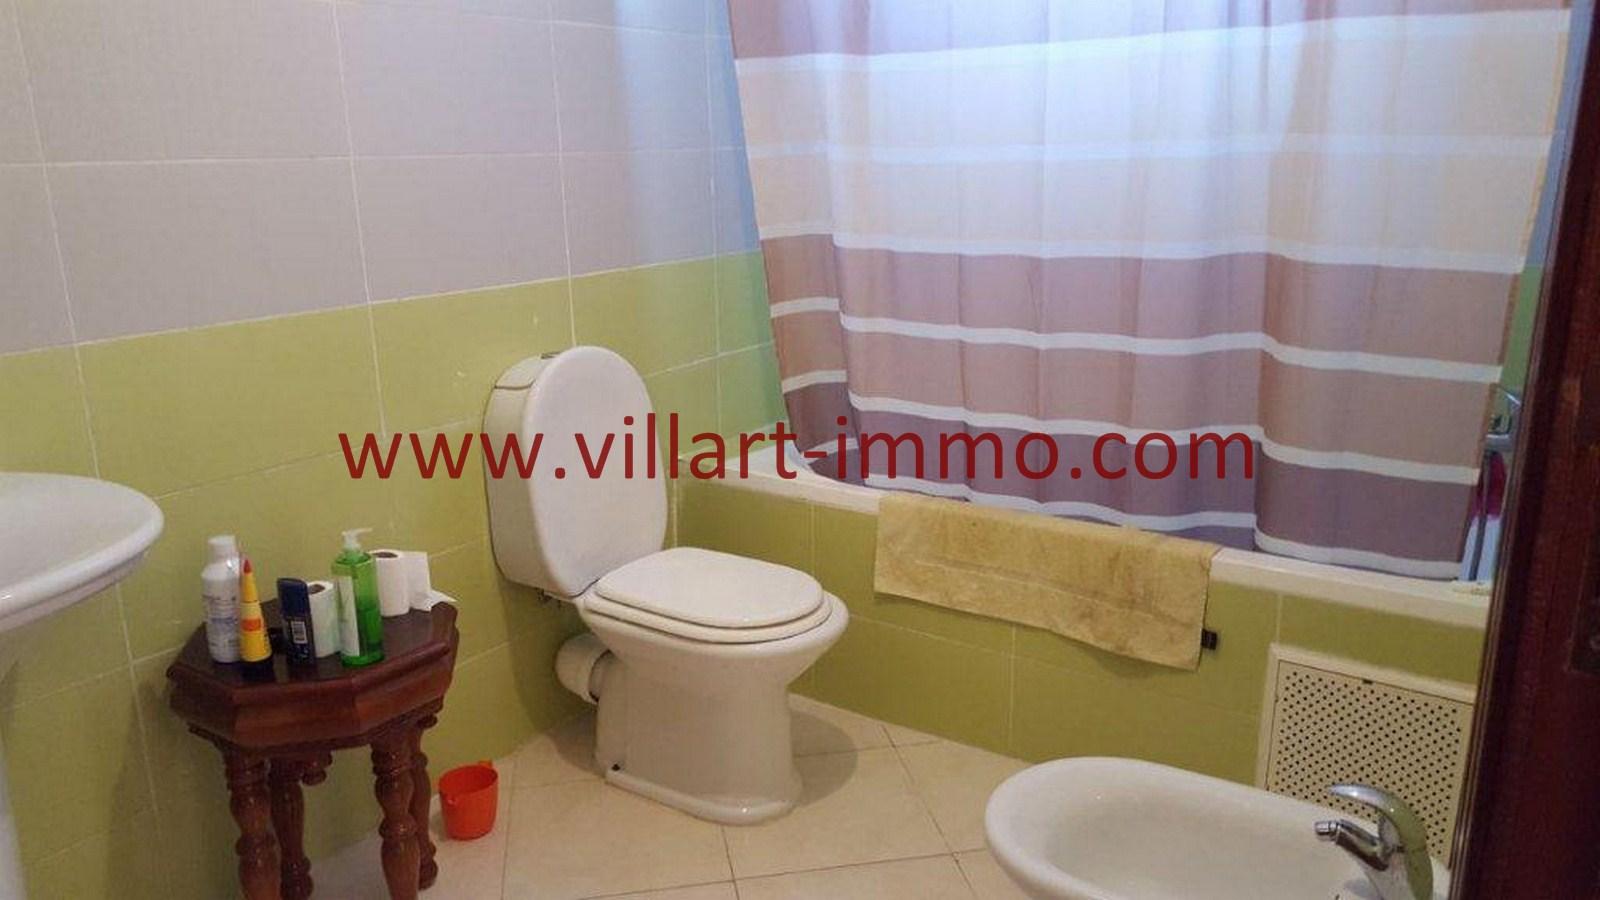 6-Vente-Appartement-Tanger-Salle de bain -VA509-Villart Immo